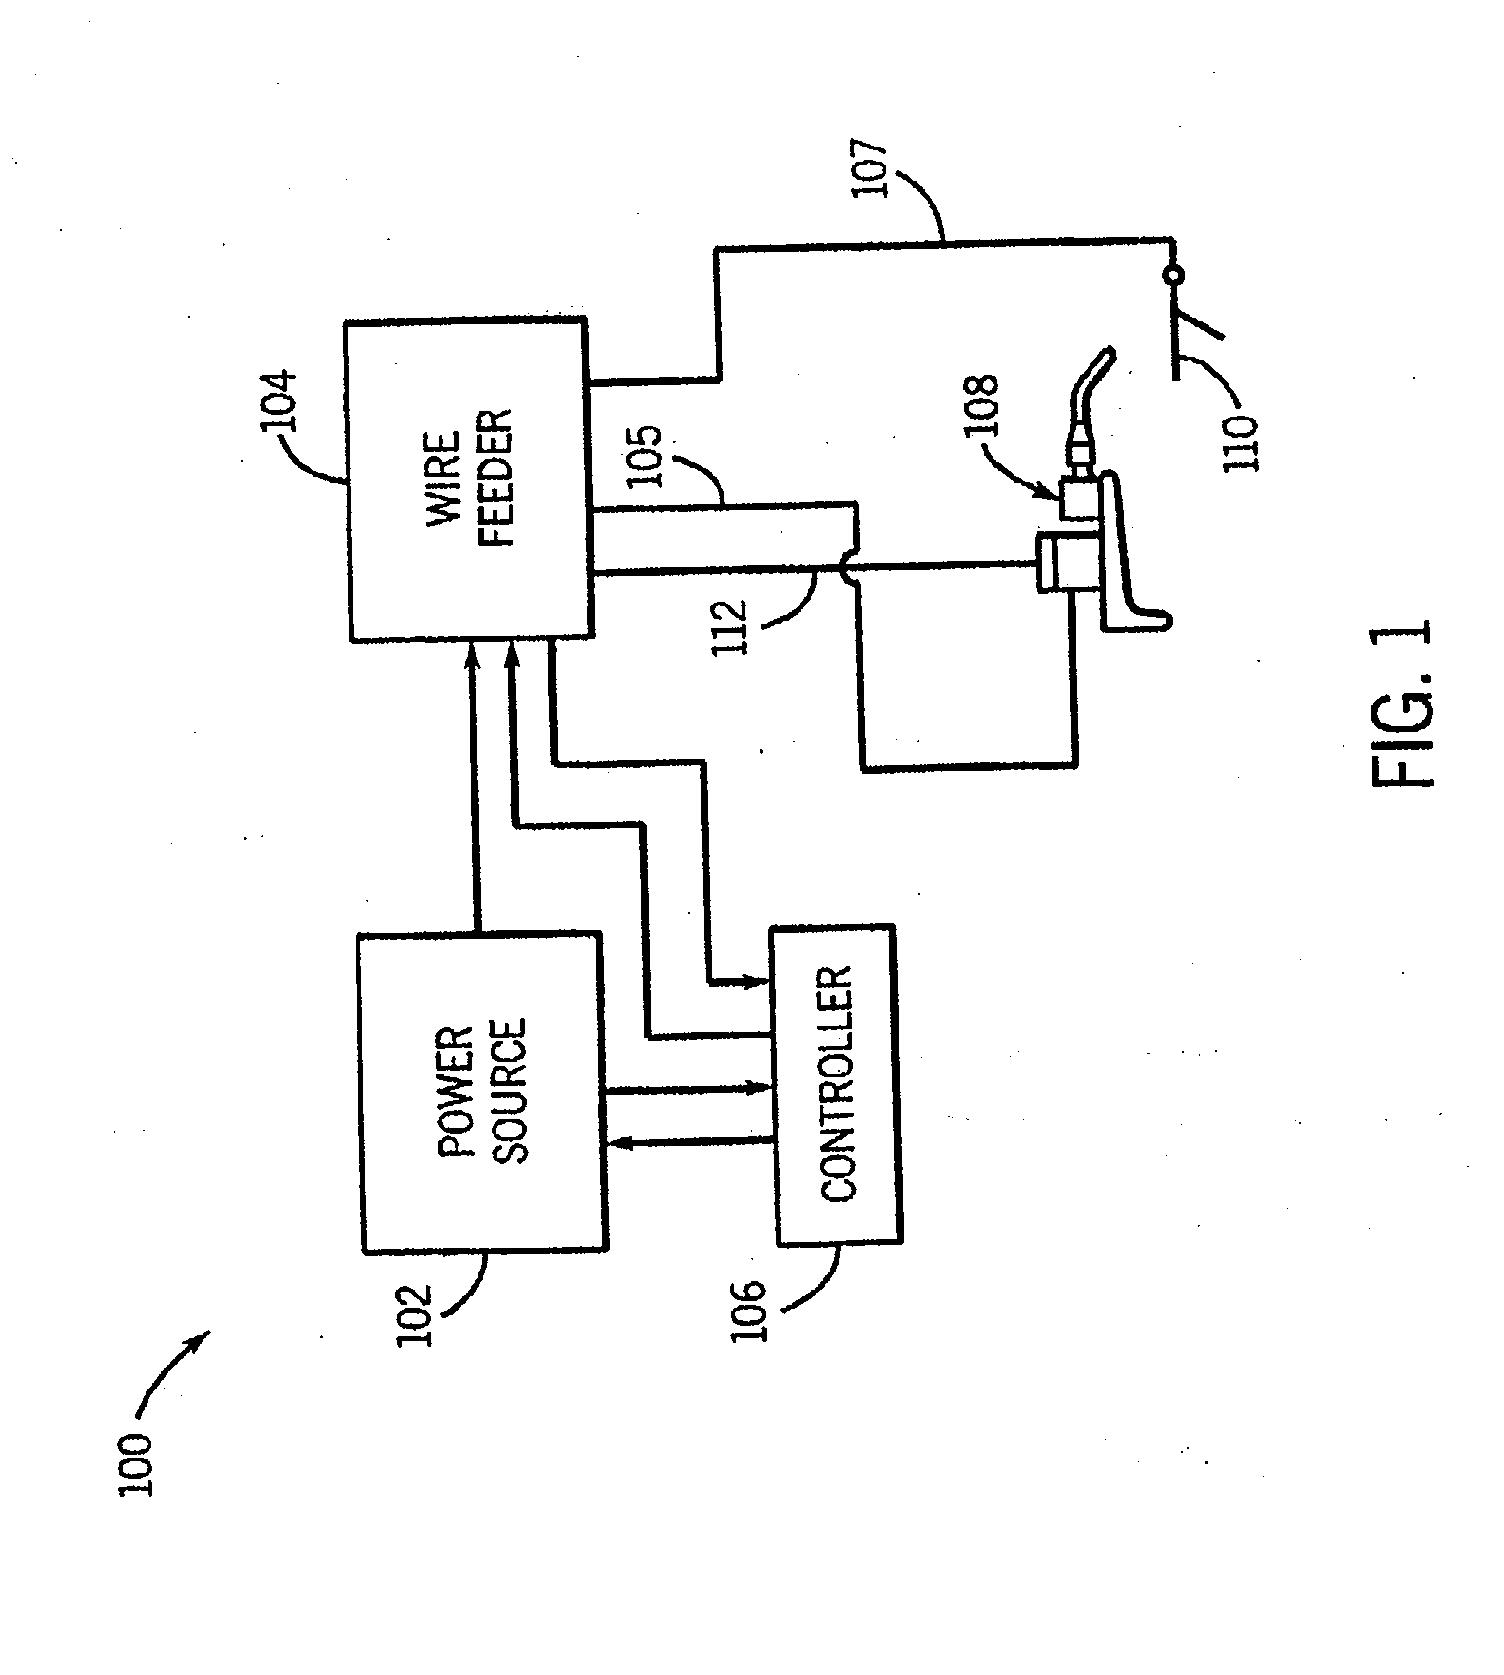 patent ep1384546a2